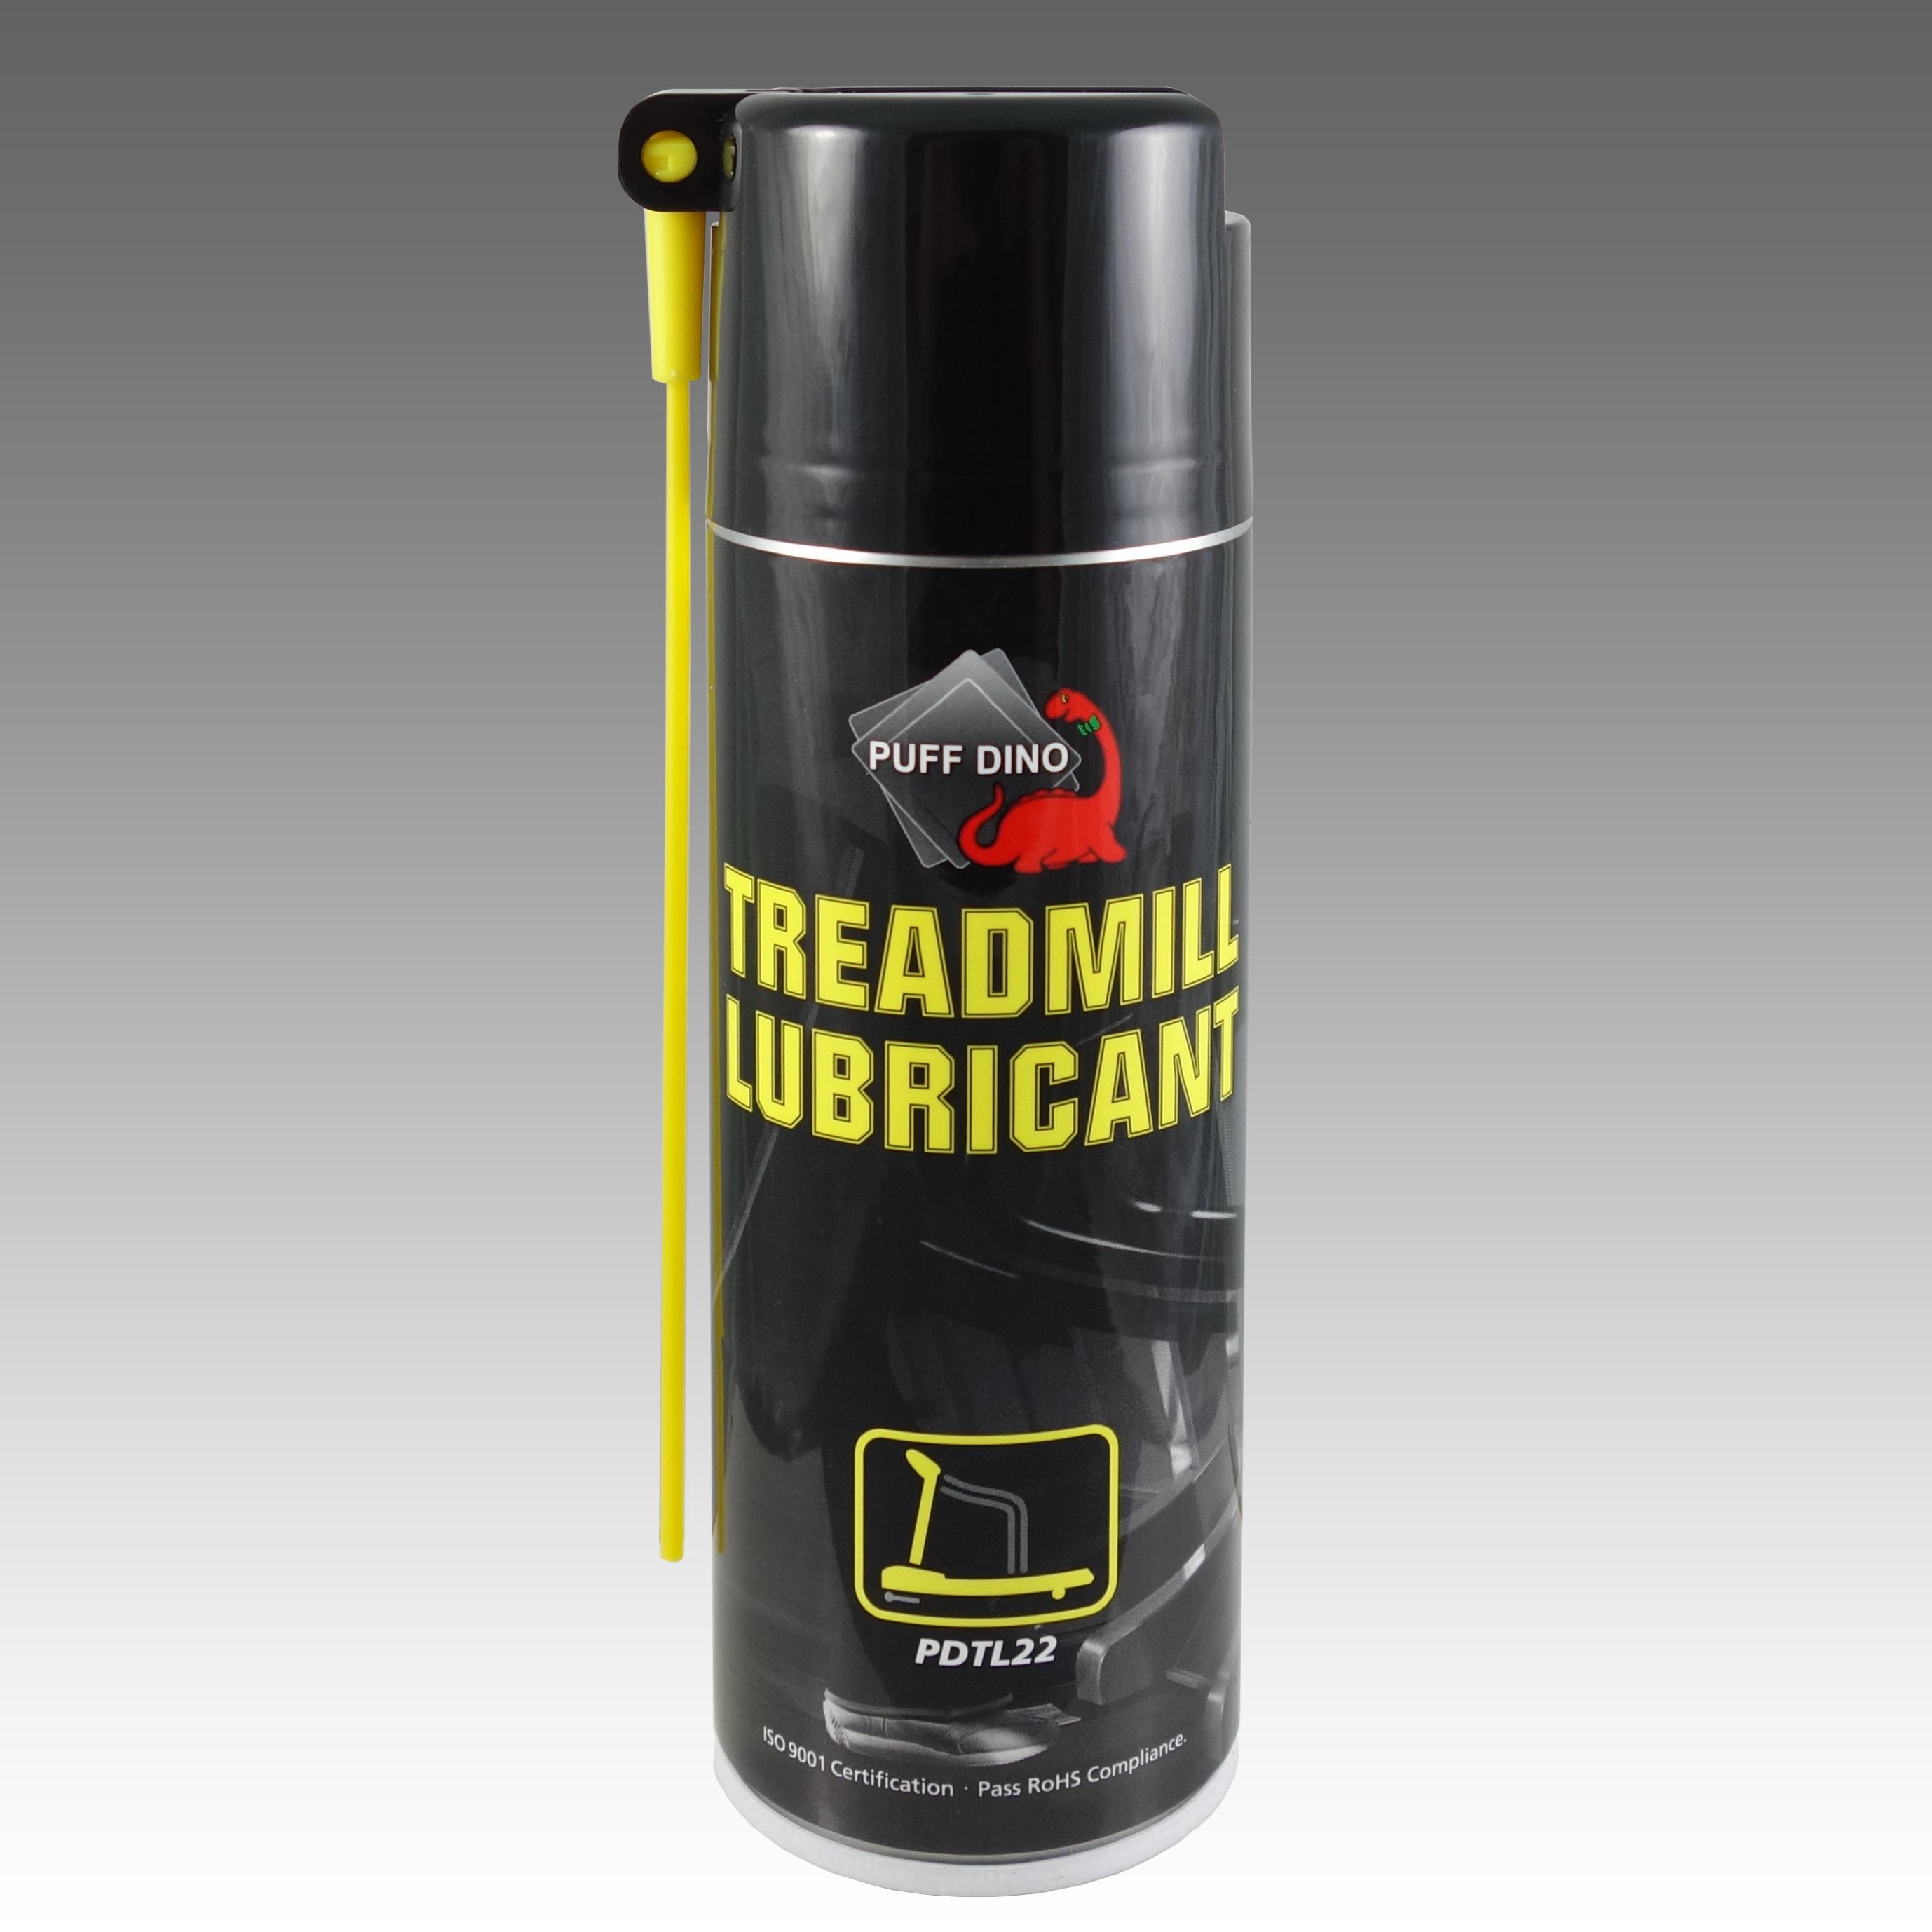 PUFF DINO Treadmill Lubricant - 220ml | 33 Years of High